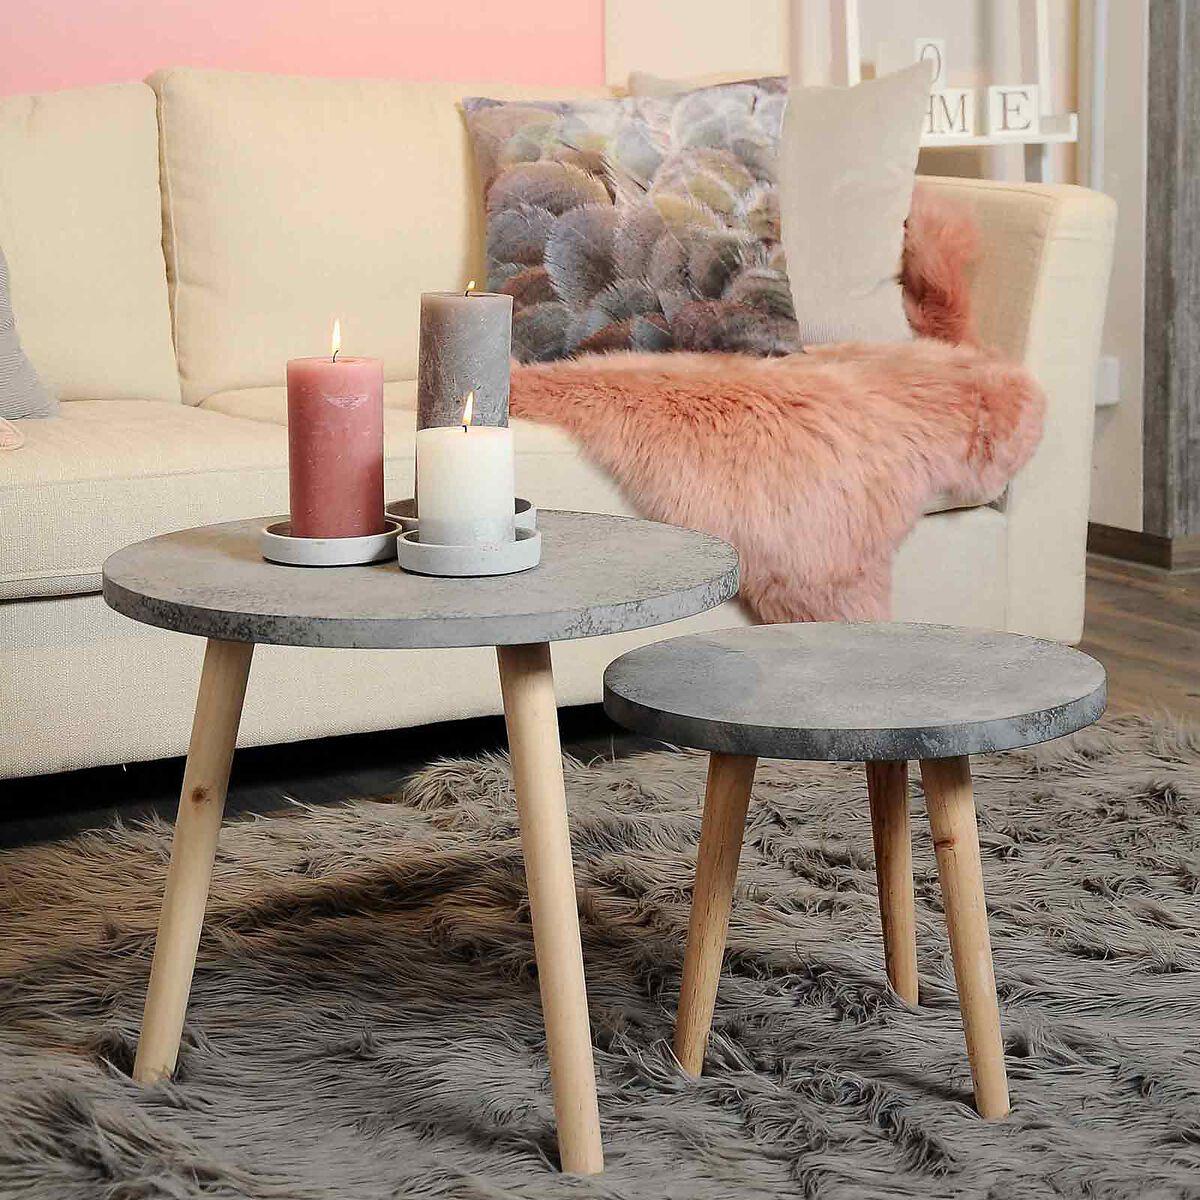 beistelltisch in betonoptik aus kiefernholz d ca 50cm h ca 42cm grau depot de. Black Bedroom Furniture Sets. Home Design Ideas